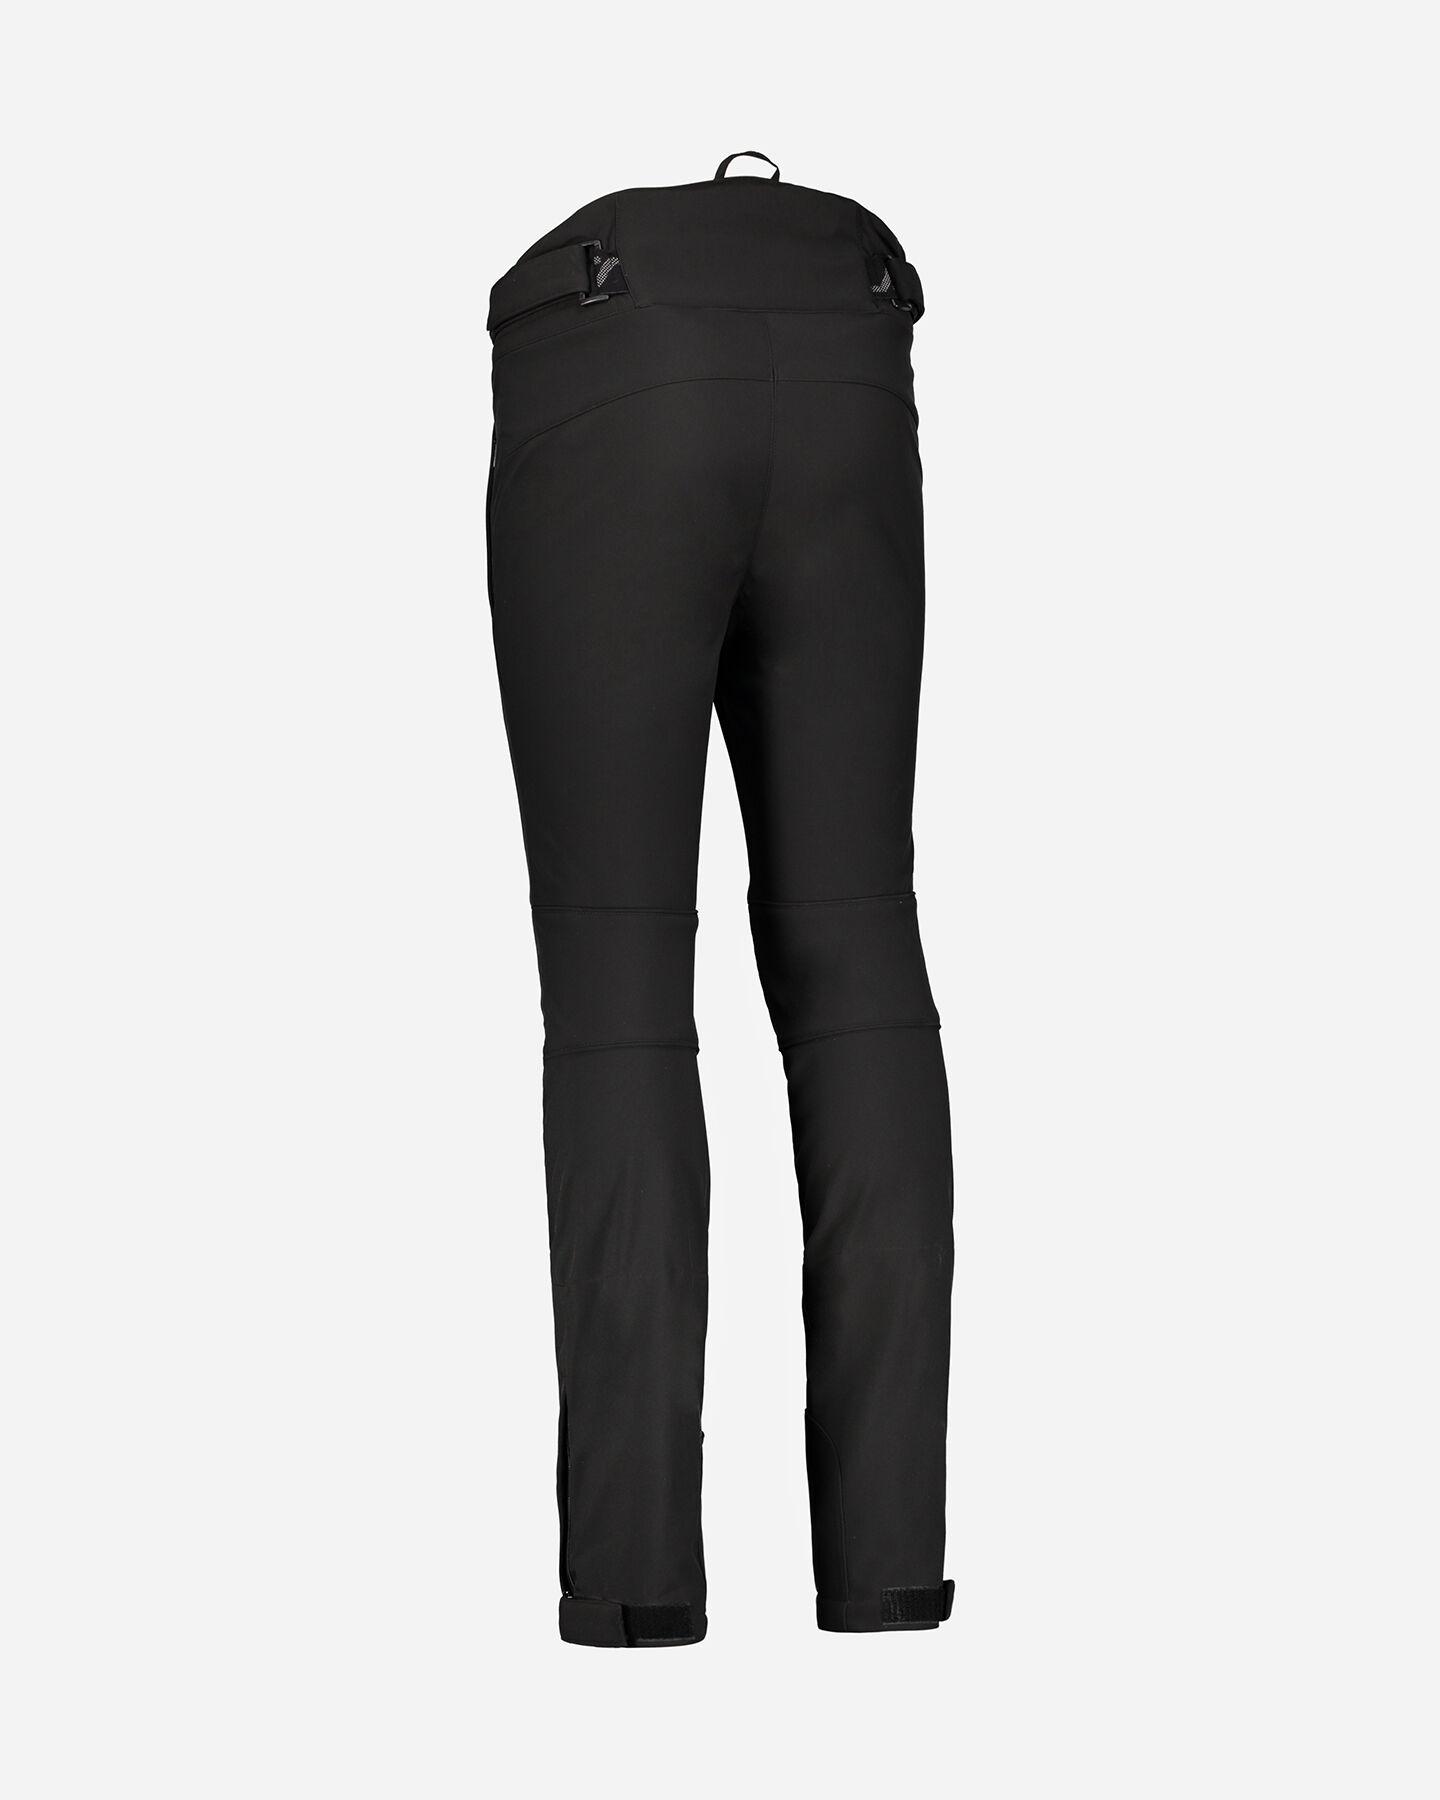 Pantalone sci FILA SKI SS PANTS M S4034199 scatto 5